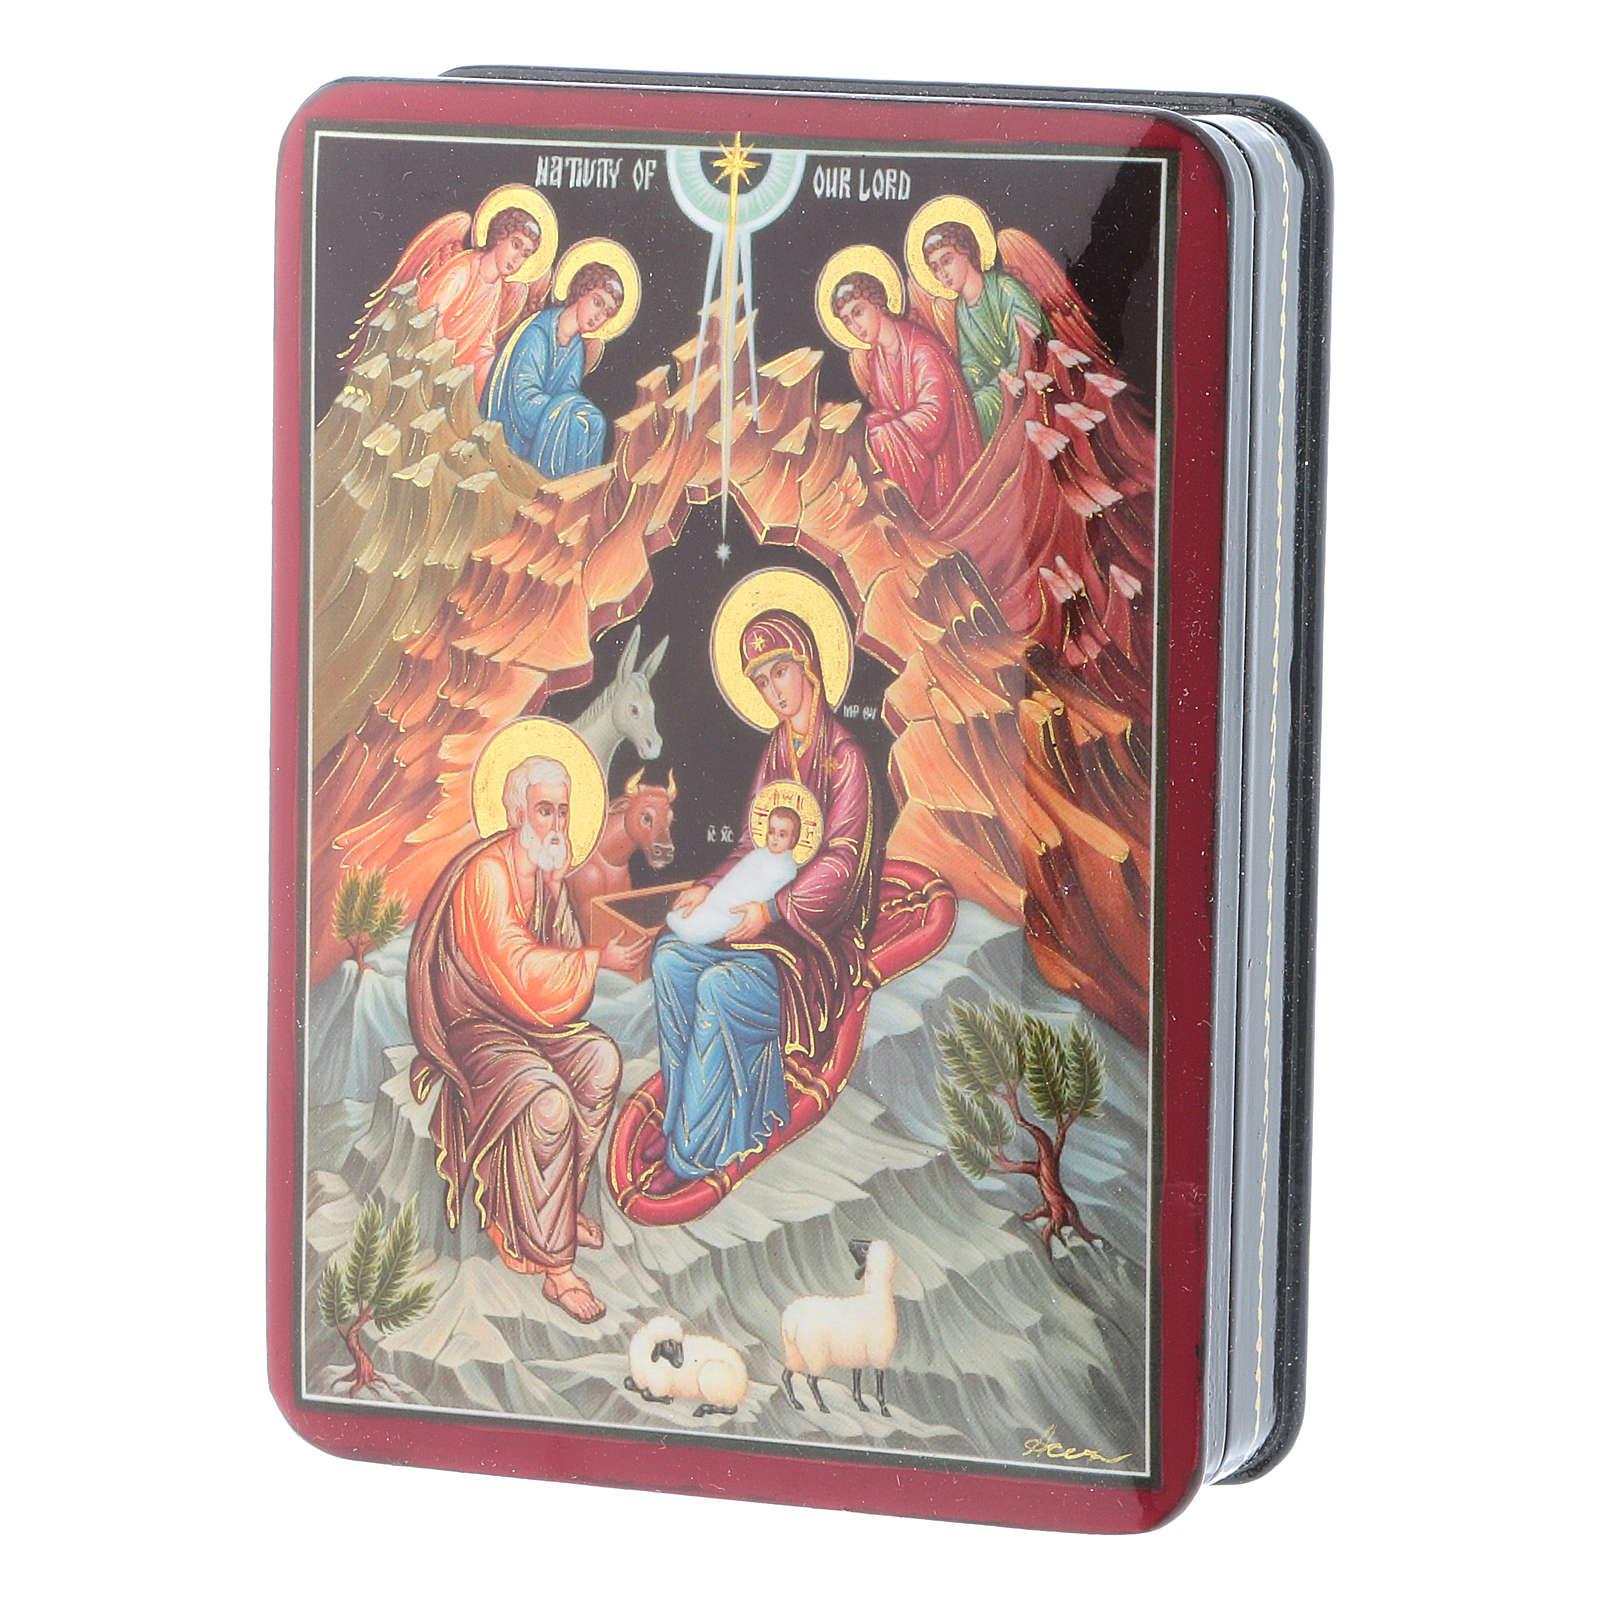 Scatola russa Papier-mâché Sacra Famiglia Fedoskino style 15x11 4